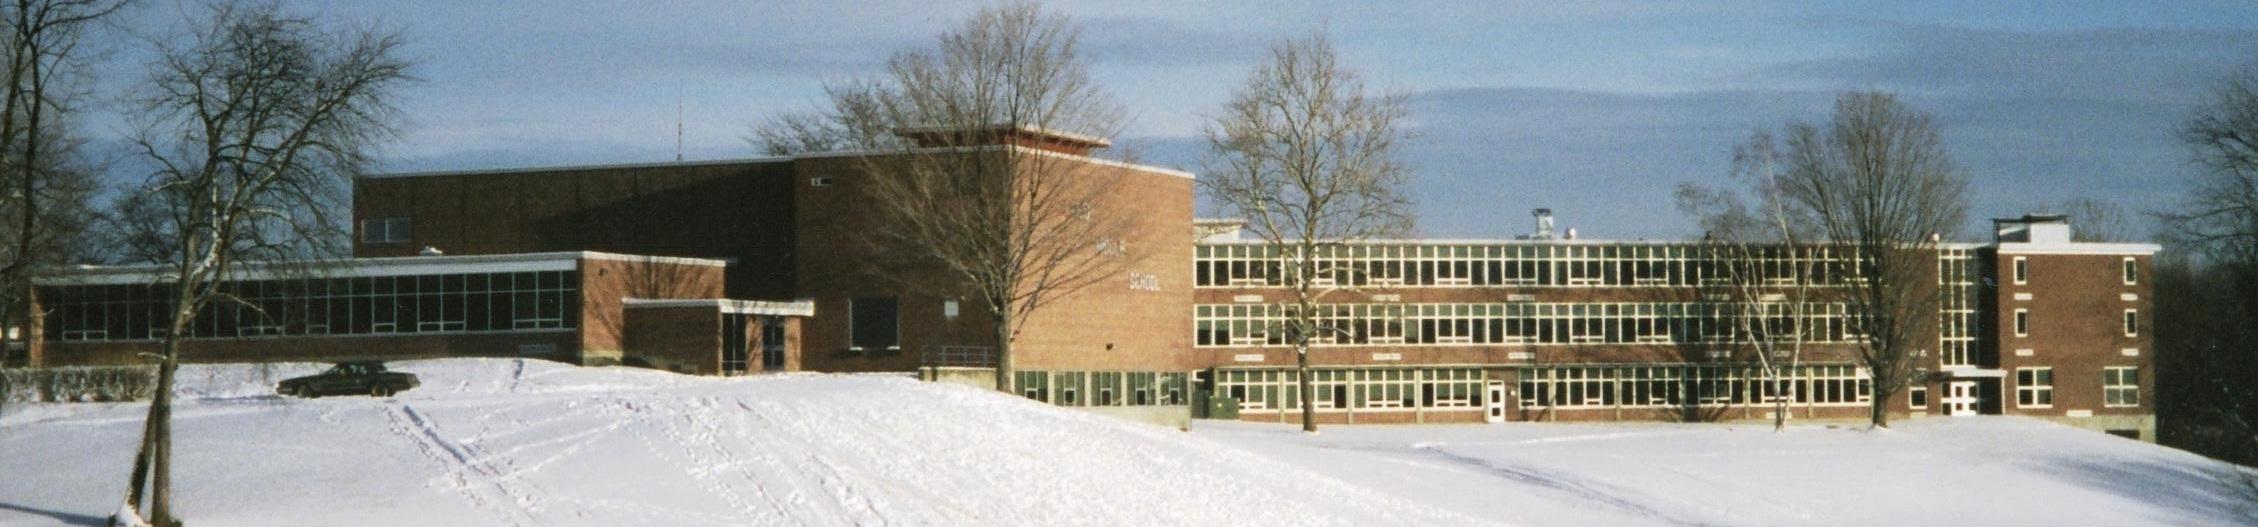 Reid Middle School, Pittsfield, Massachusetts